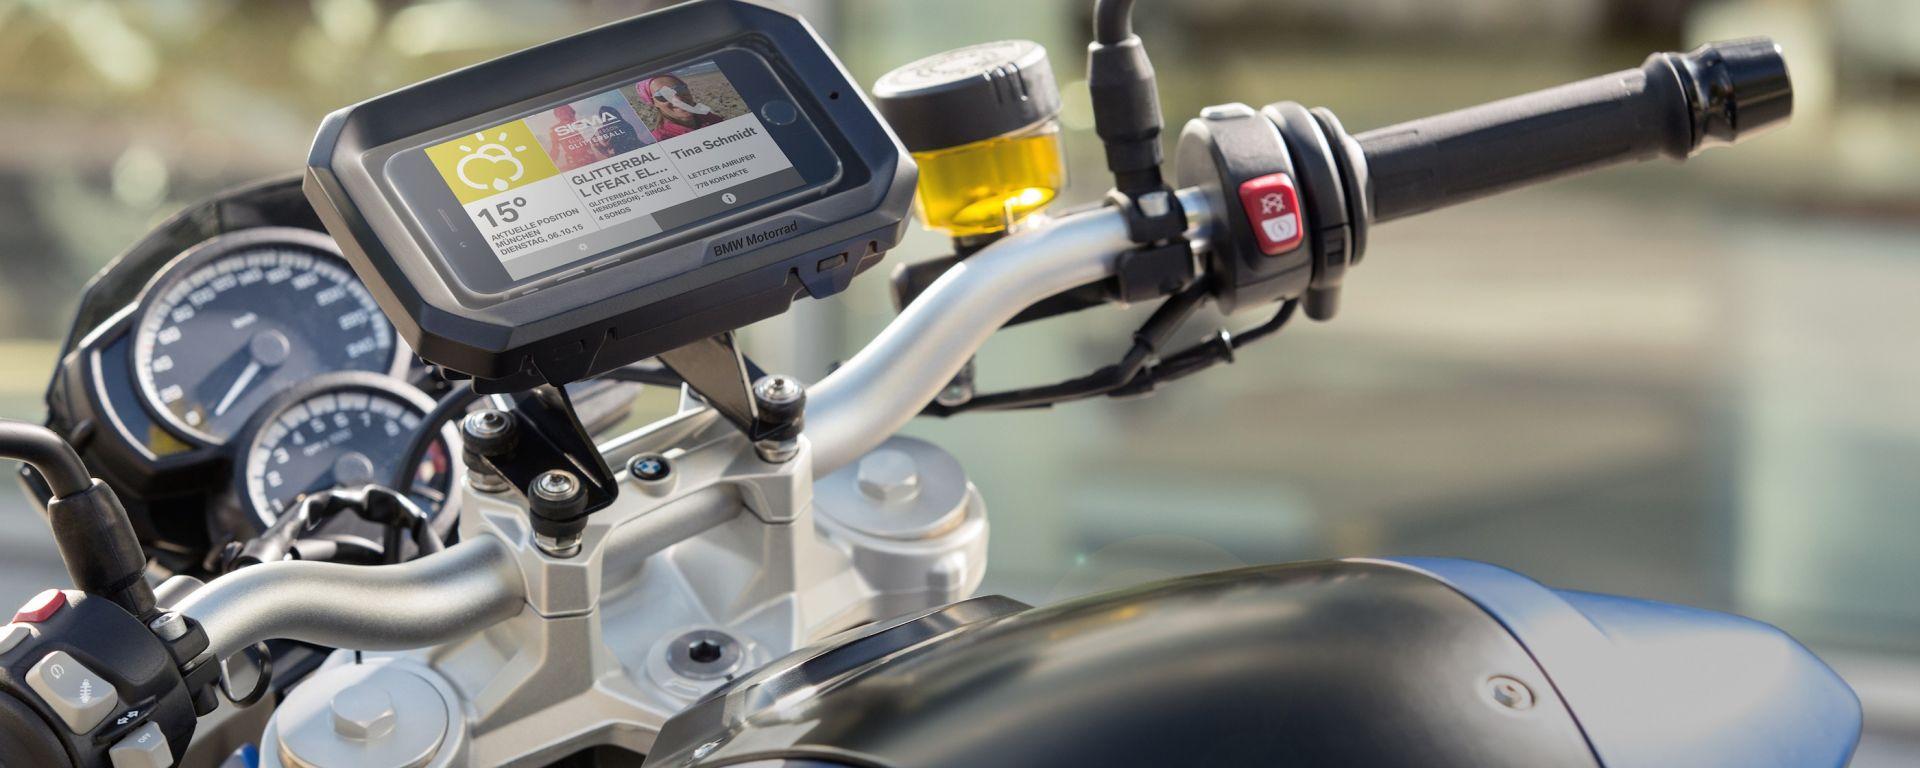 Custodia per smartphone BMW Motorrad